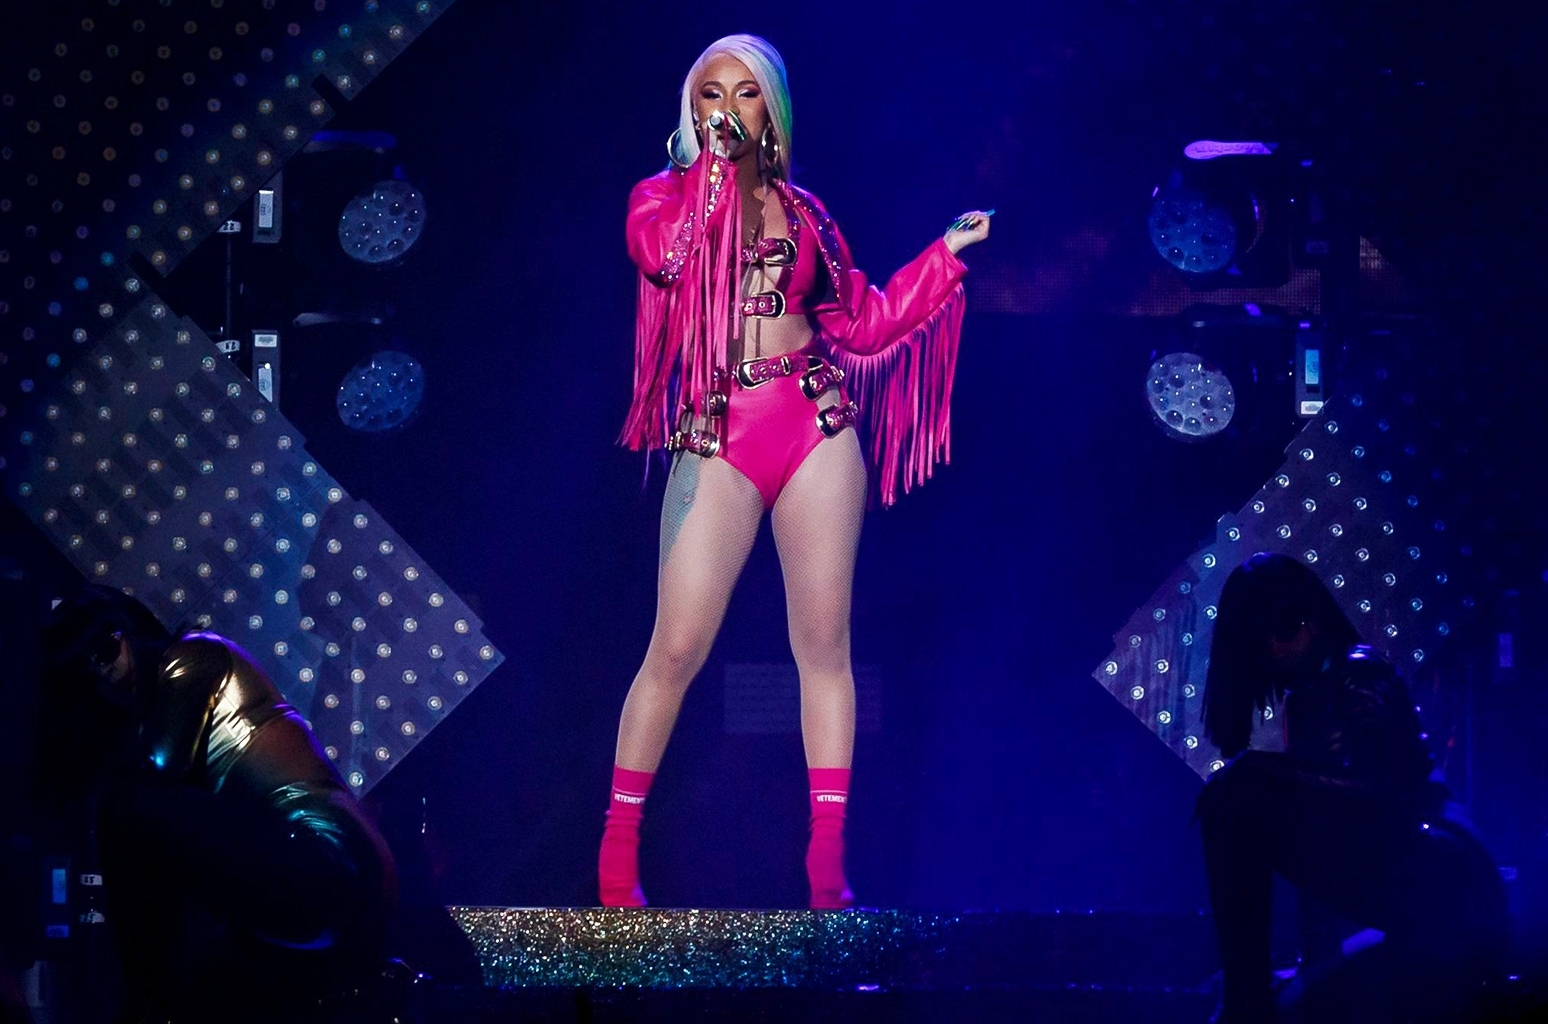 Cardi B's 'girls Like You' Performance In Atlanta: Watch with regard to Cardi B Super Bowl 2019